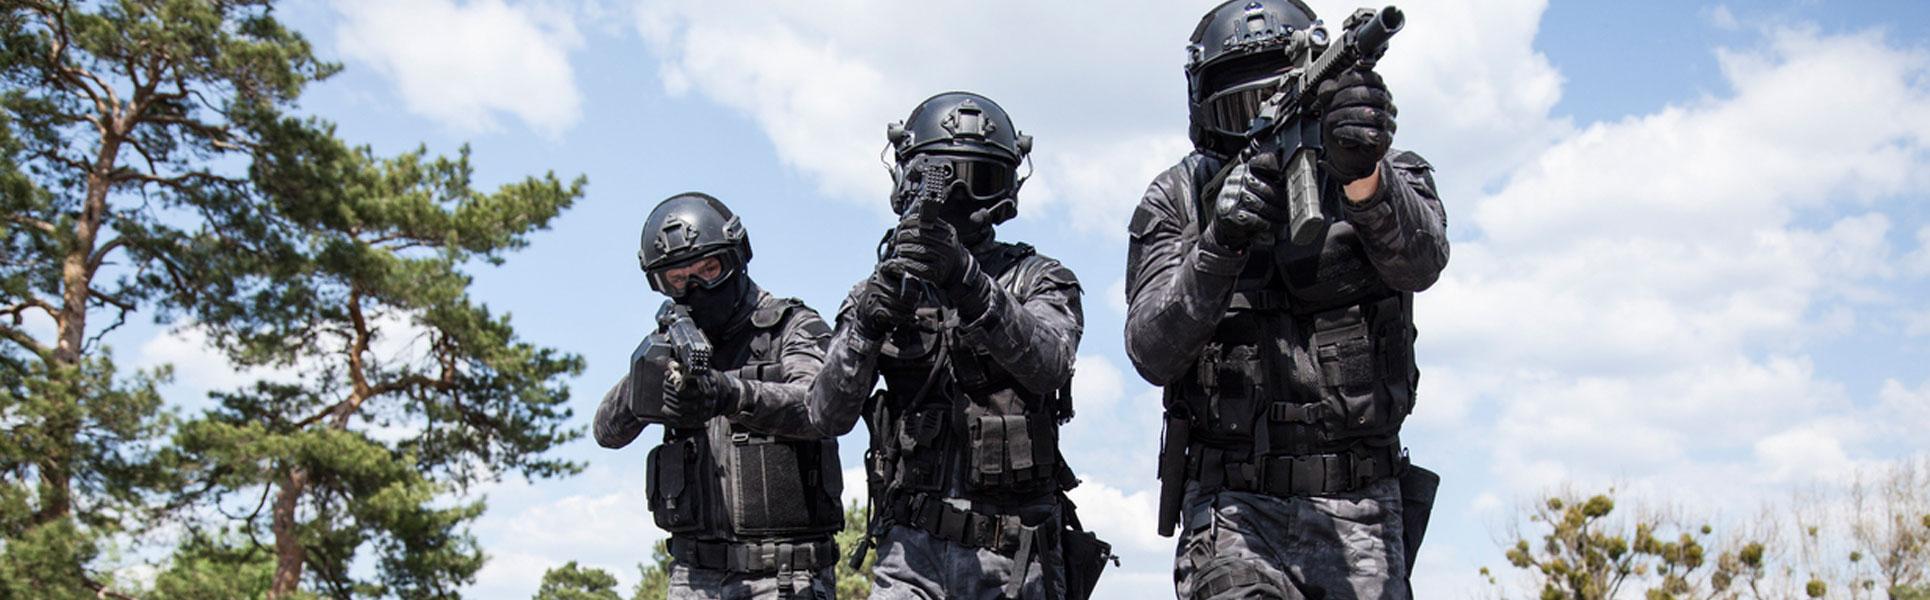 main-tactical-image.jpg